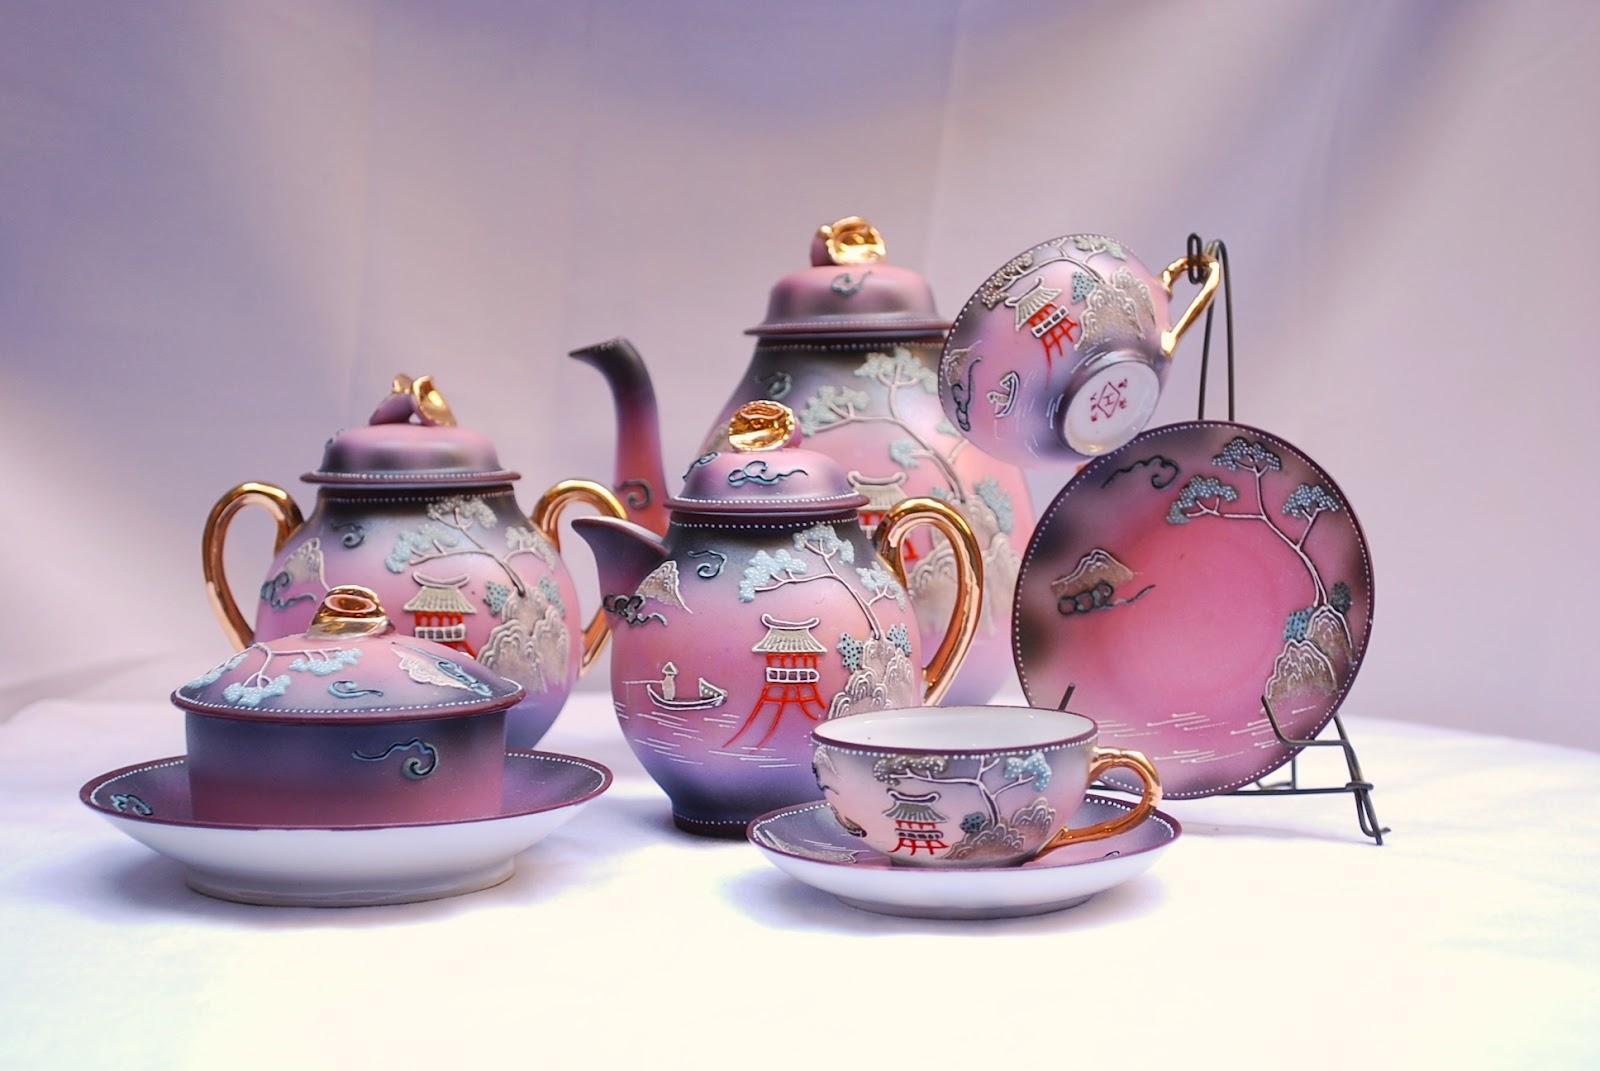 Vontade e pensamento porcelana japonesa for Marcas de vajillas de porcelana